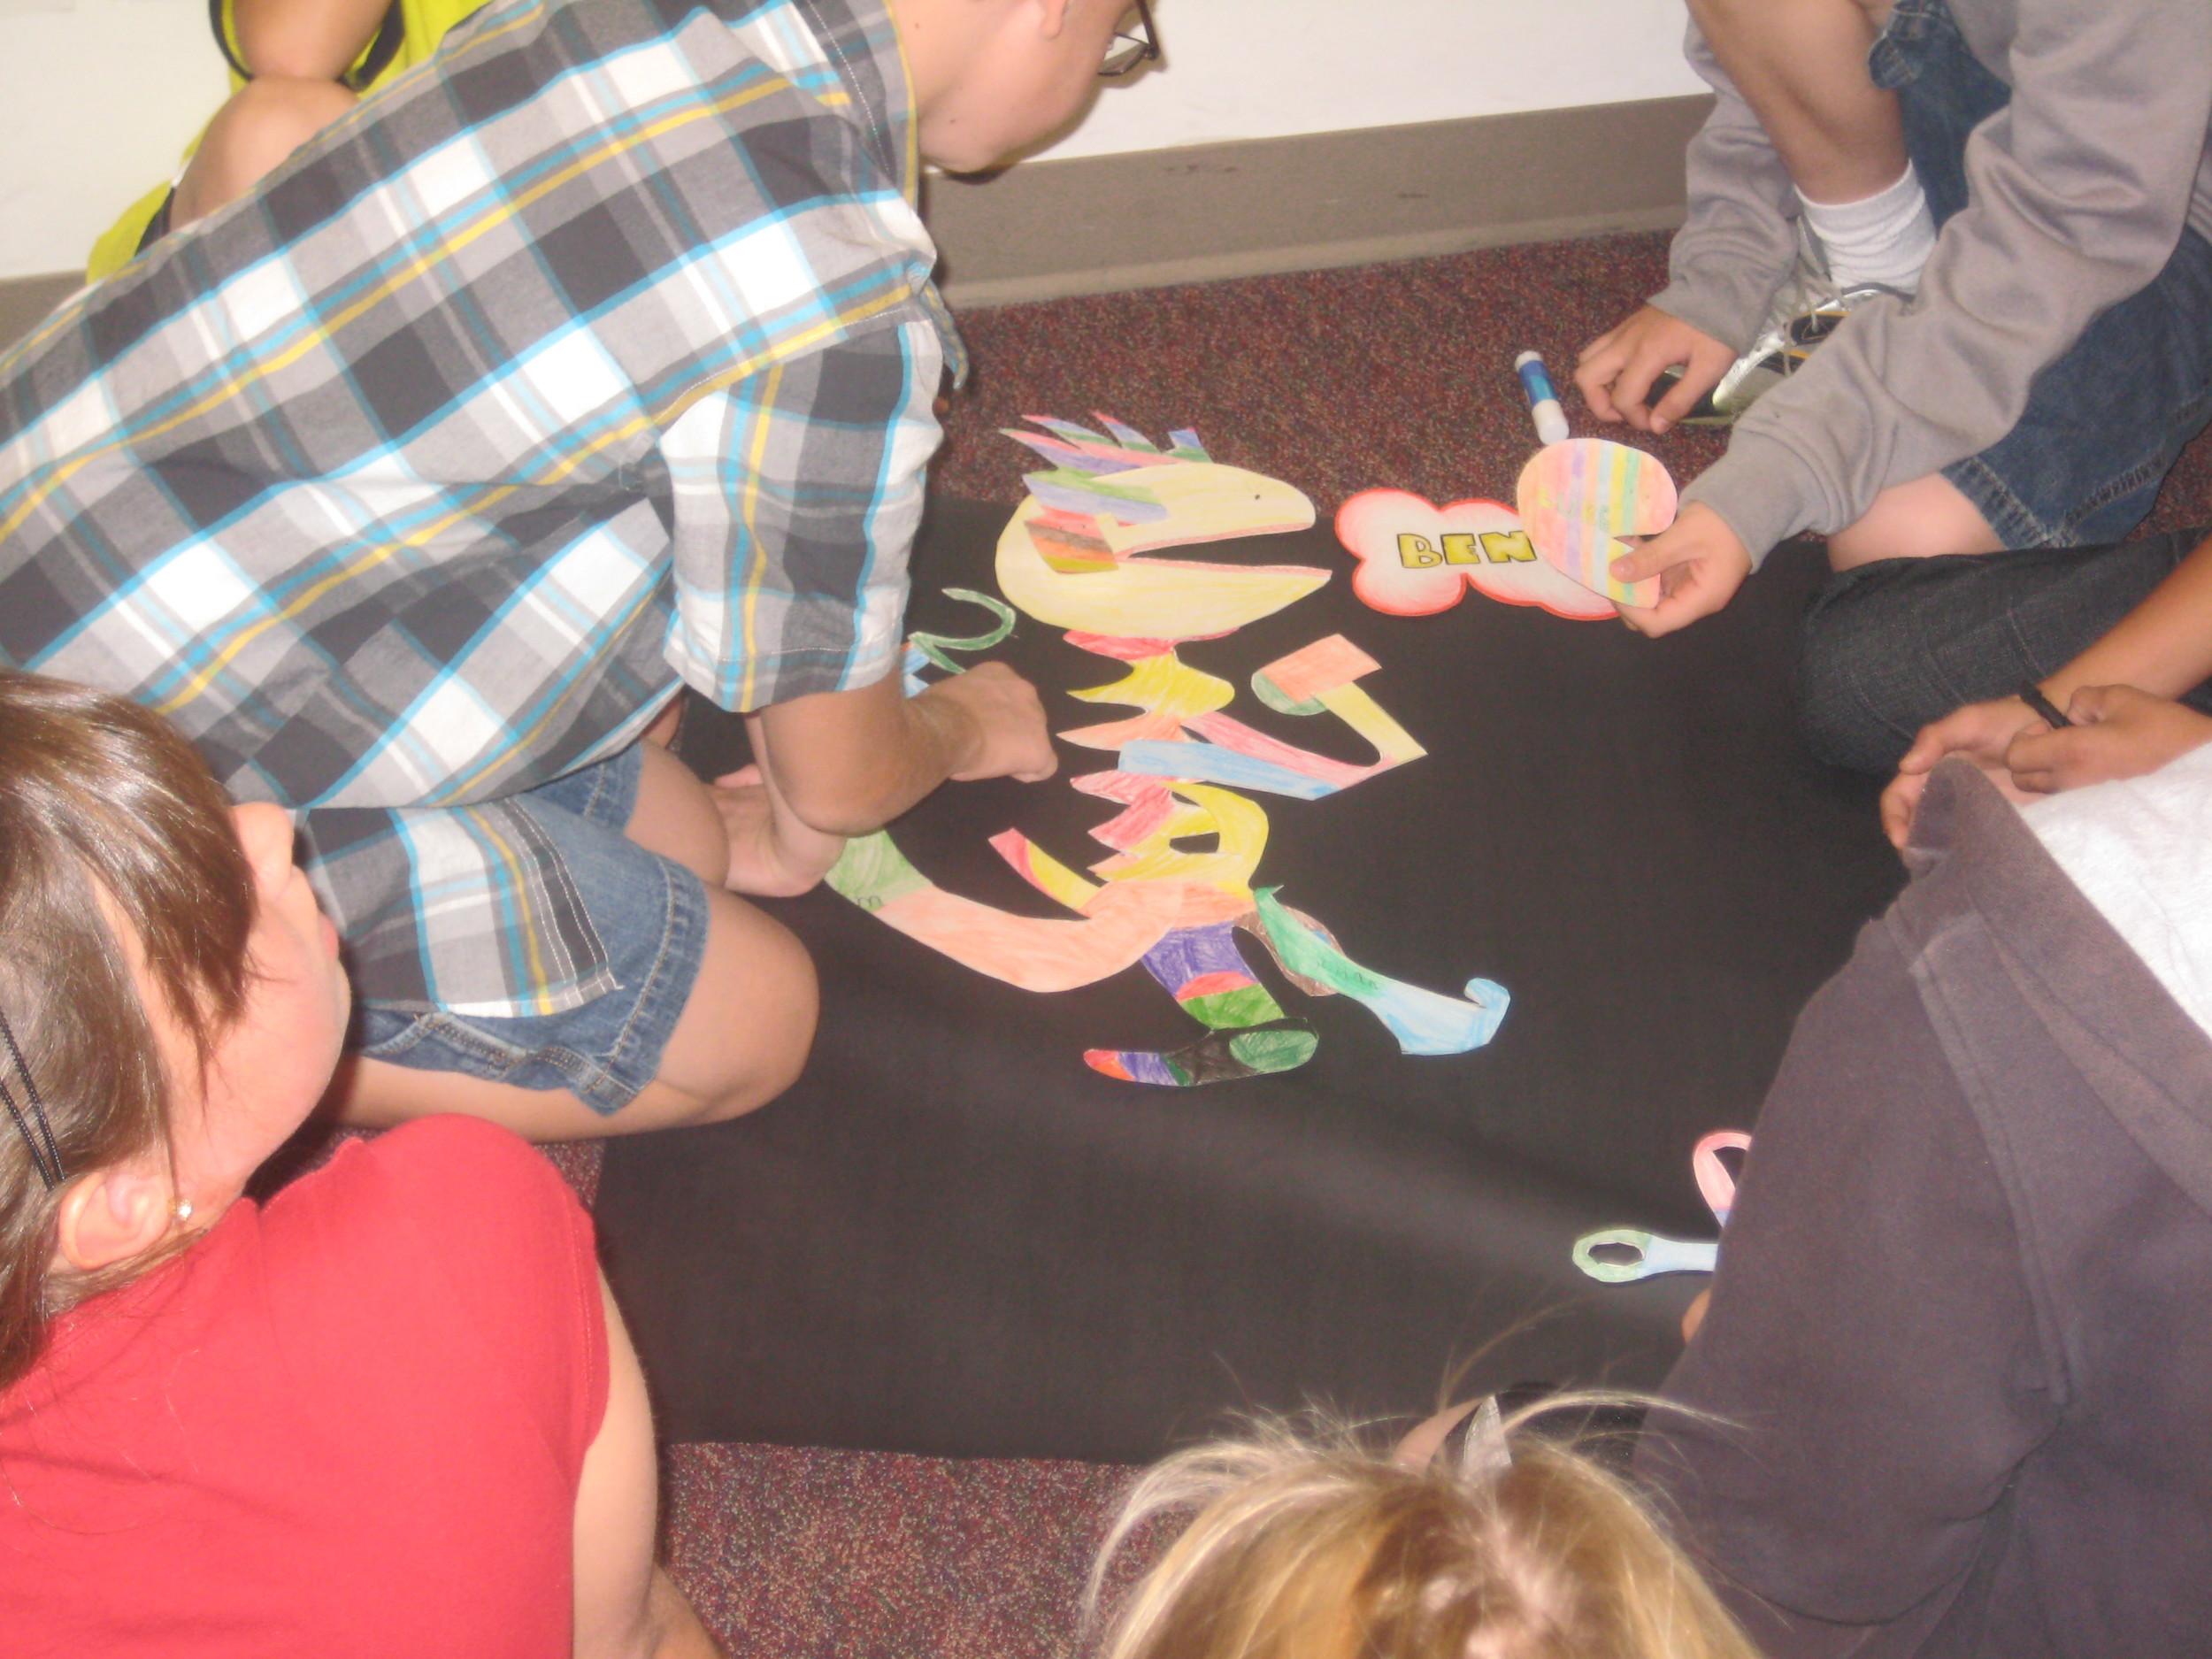 Collaborative art group